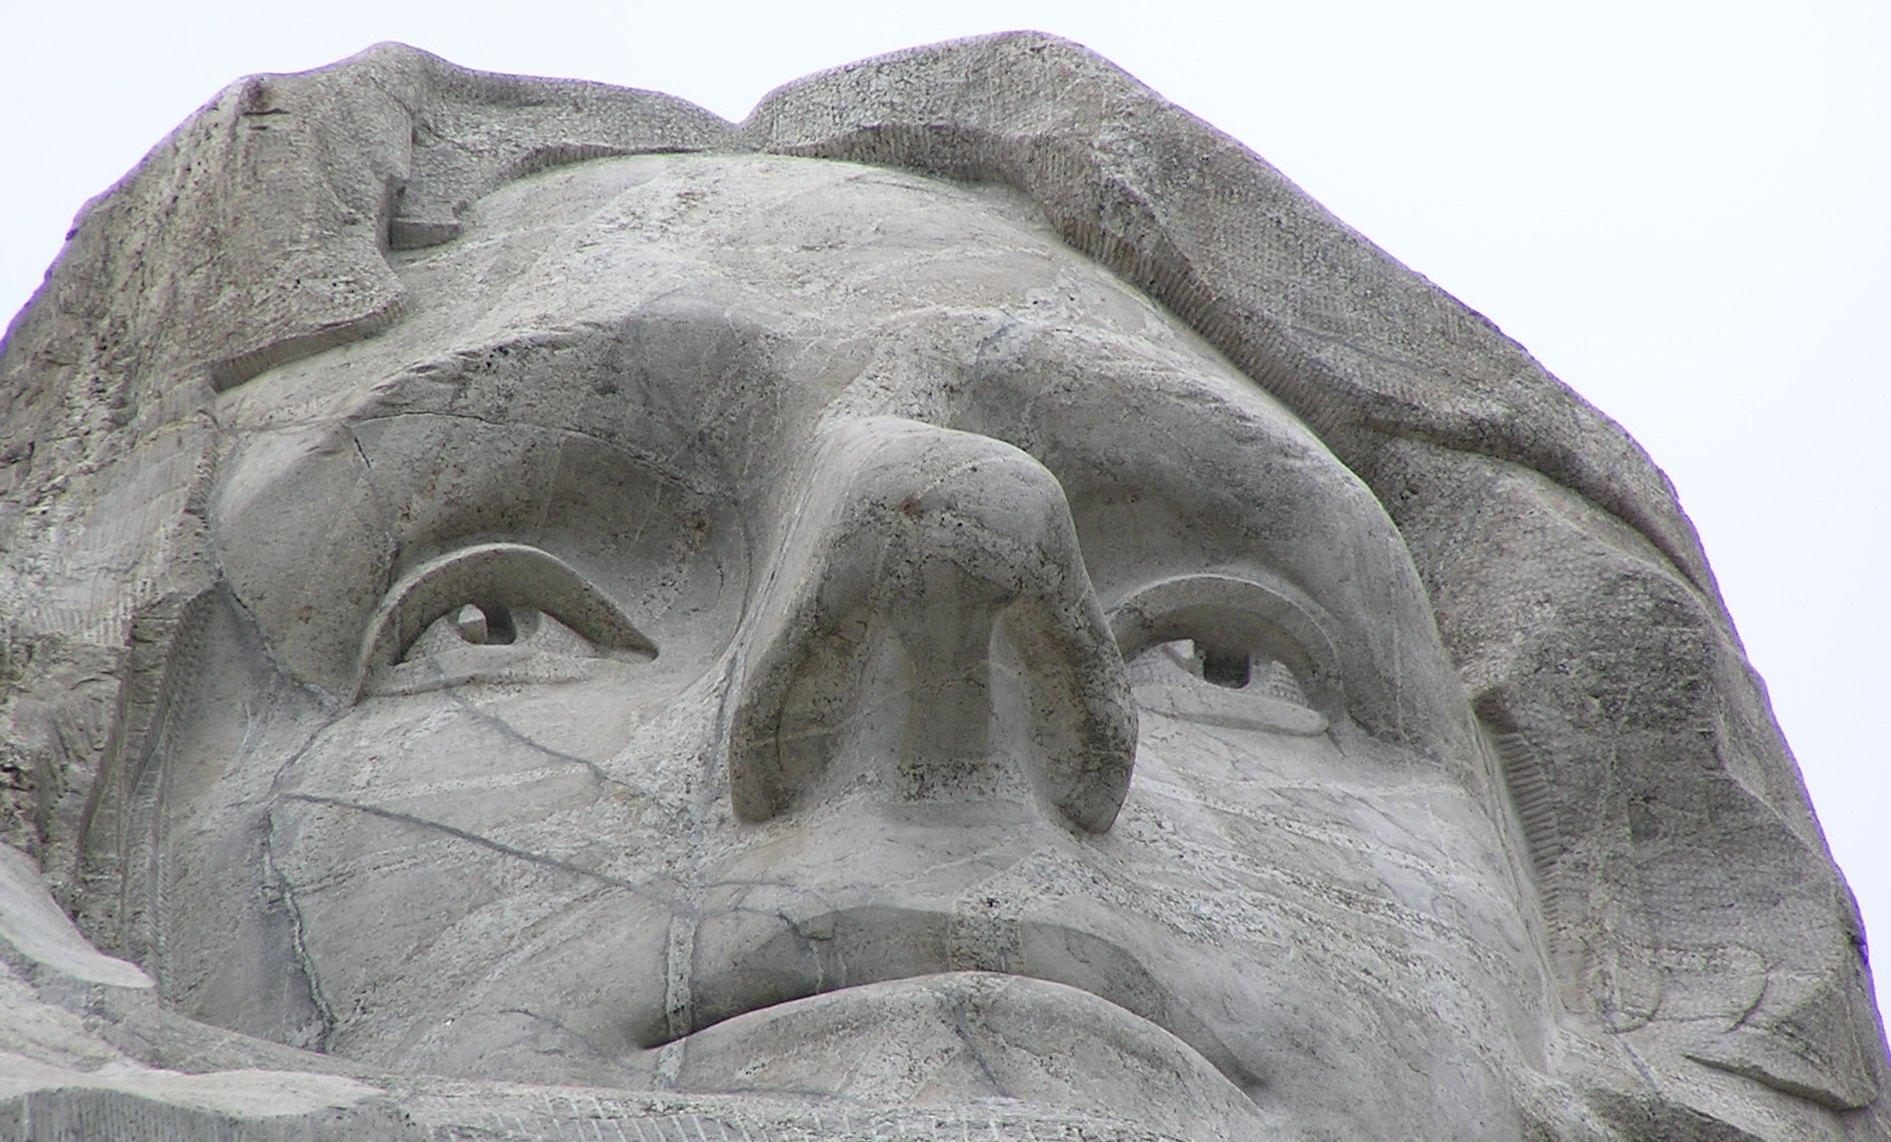 Close up photo of Thomas Jefferson on Mount Rushmore